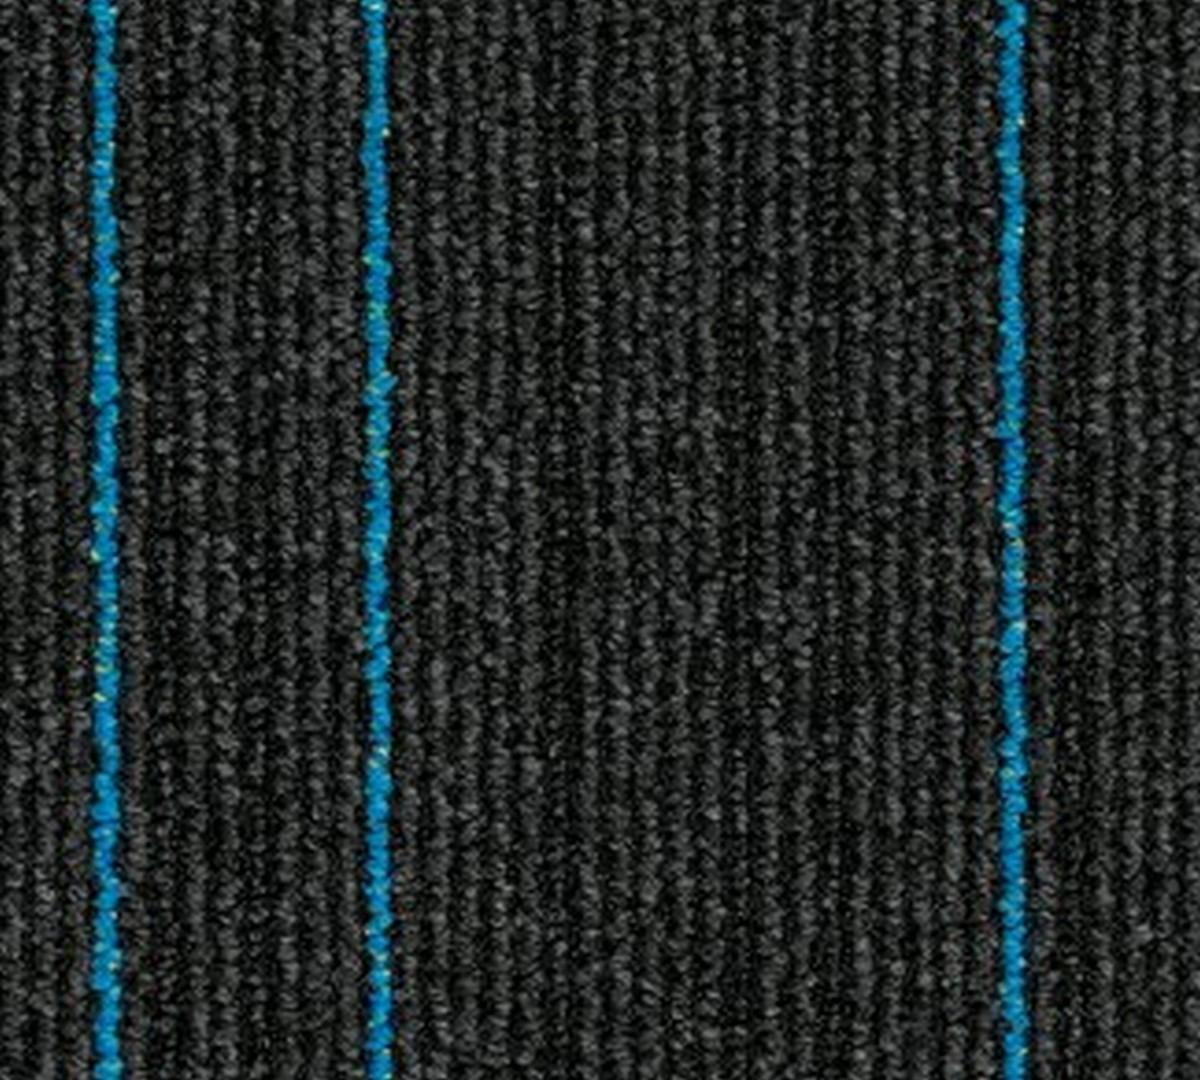 Ковровая плитка DESSO AirMaster 8208 (500*500*6 мм)